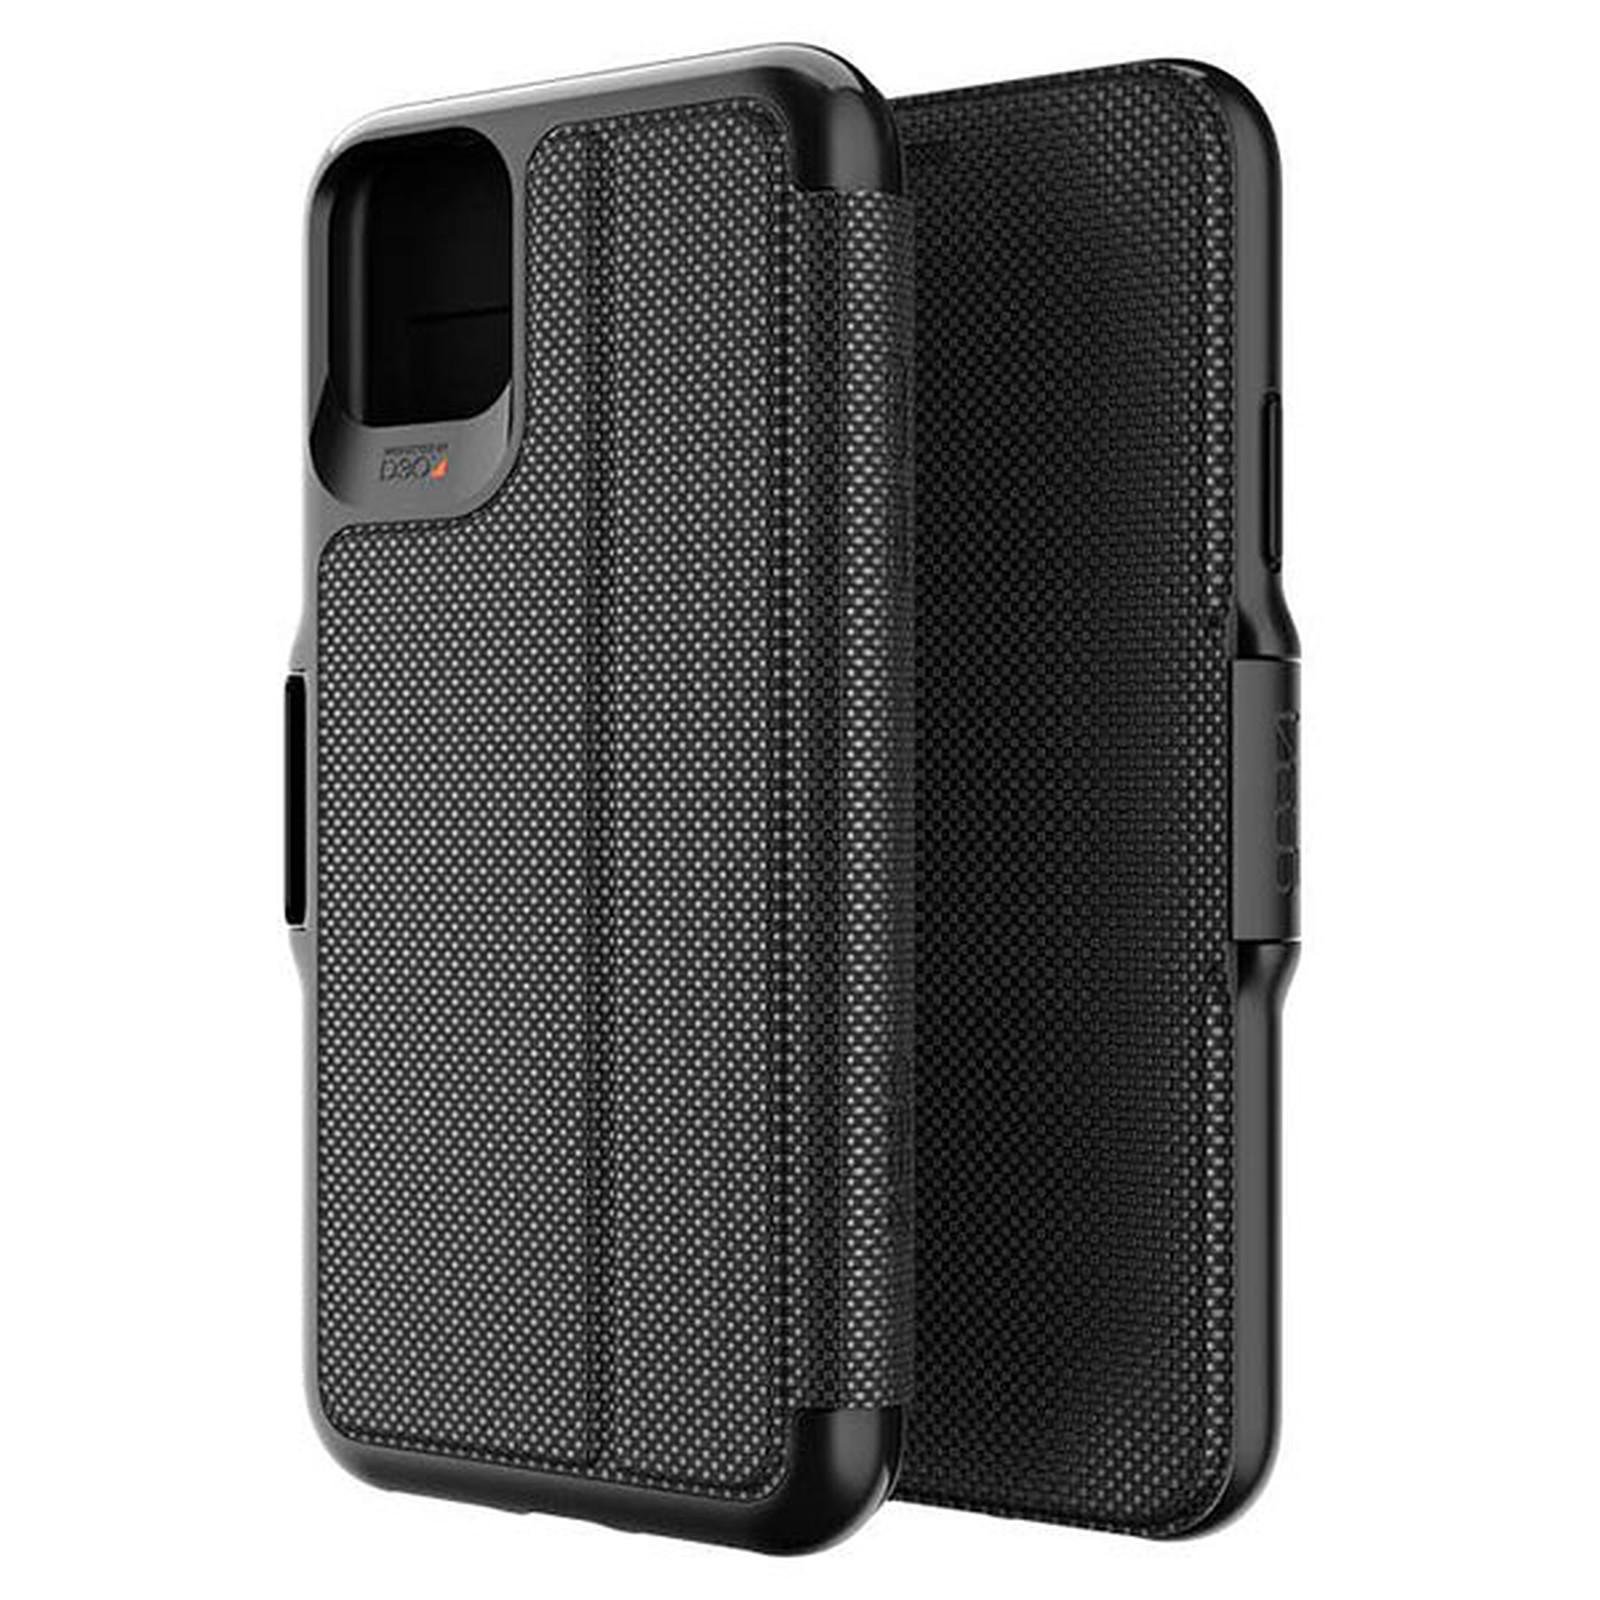 Gear4 Etui Oxford Eco Noir iPhone 11 Pro Max